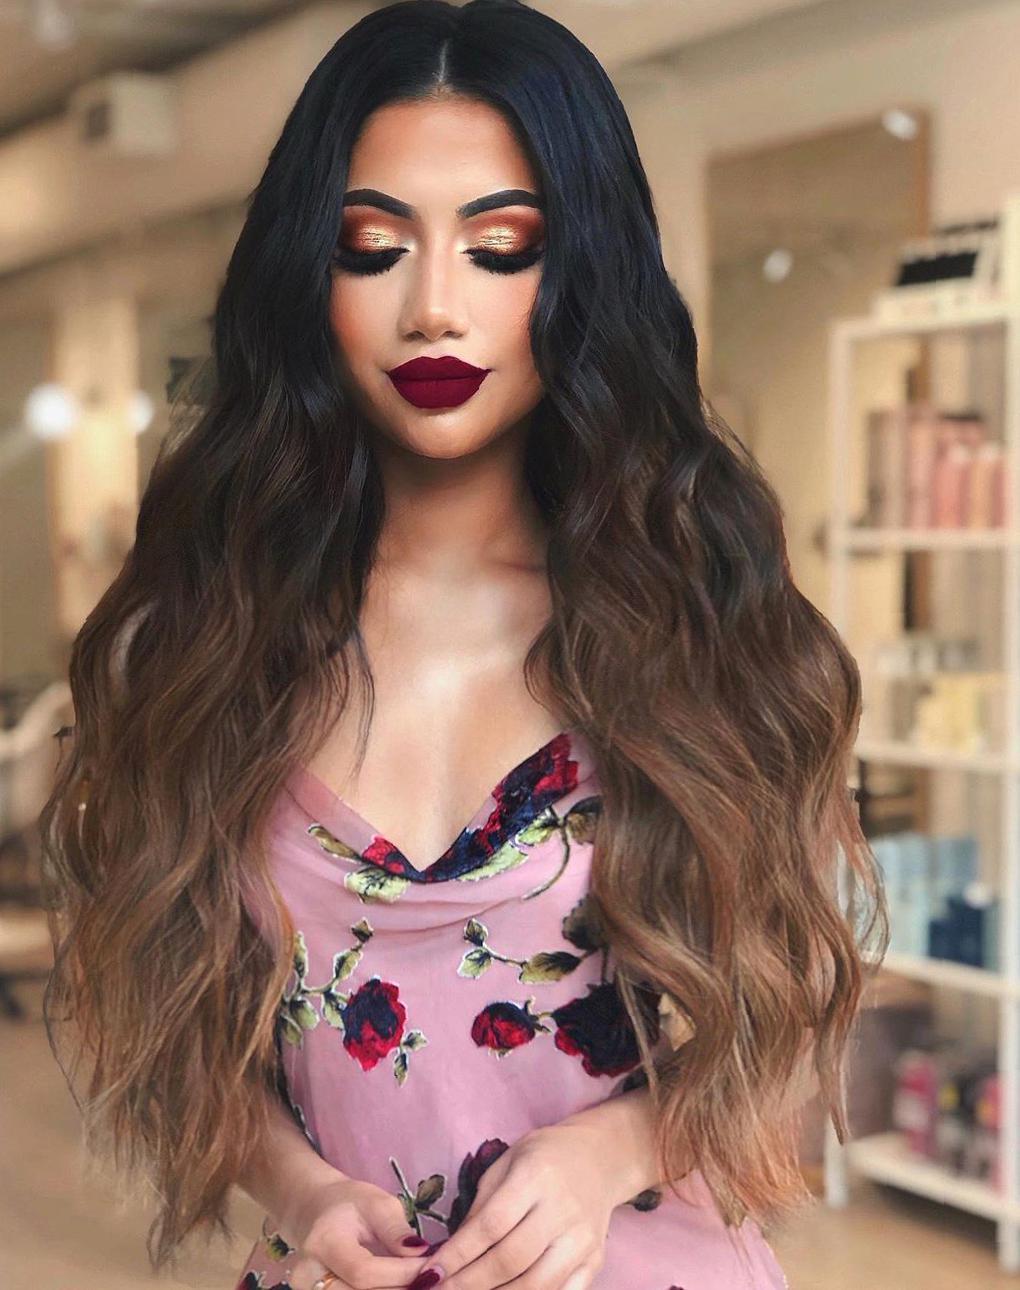 37 Makeup Looks Match Your Curls To Capture The Sight makeup looks,makeup with curls,daily makeup,makeup match to hairstyle,mature makeup,charming makeup,prom makeup,elegant makeup